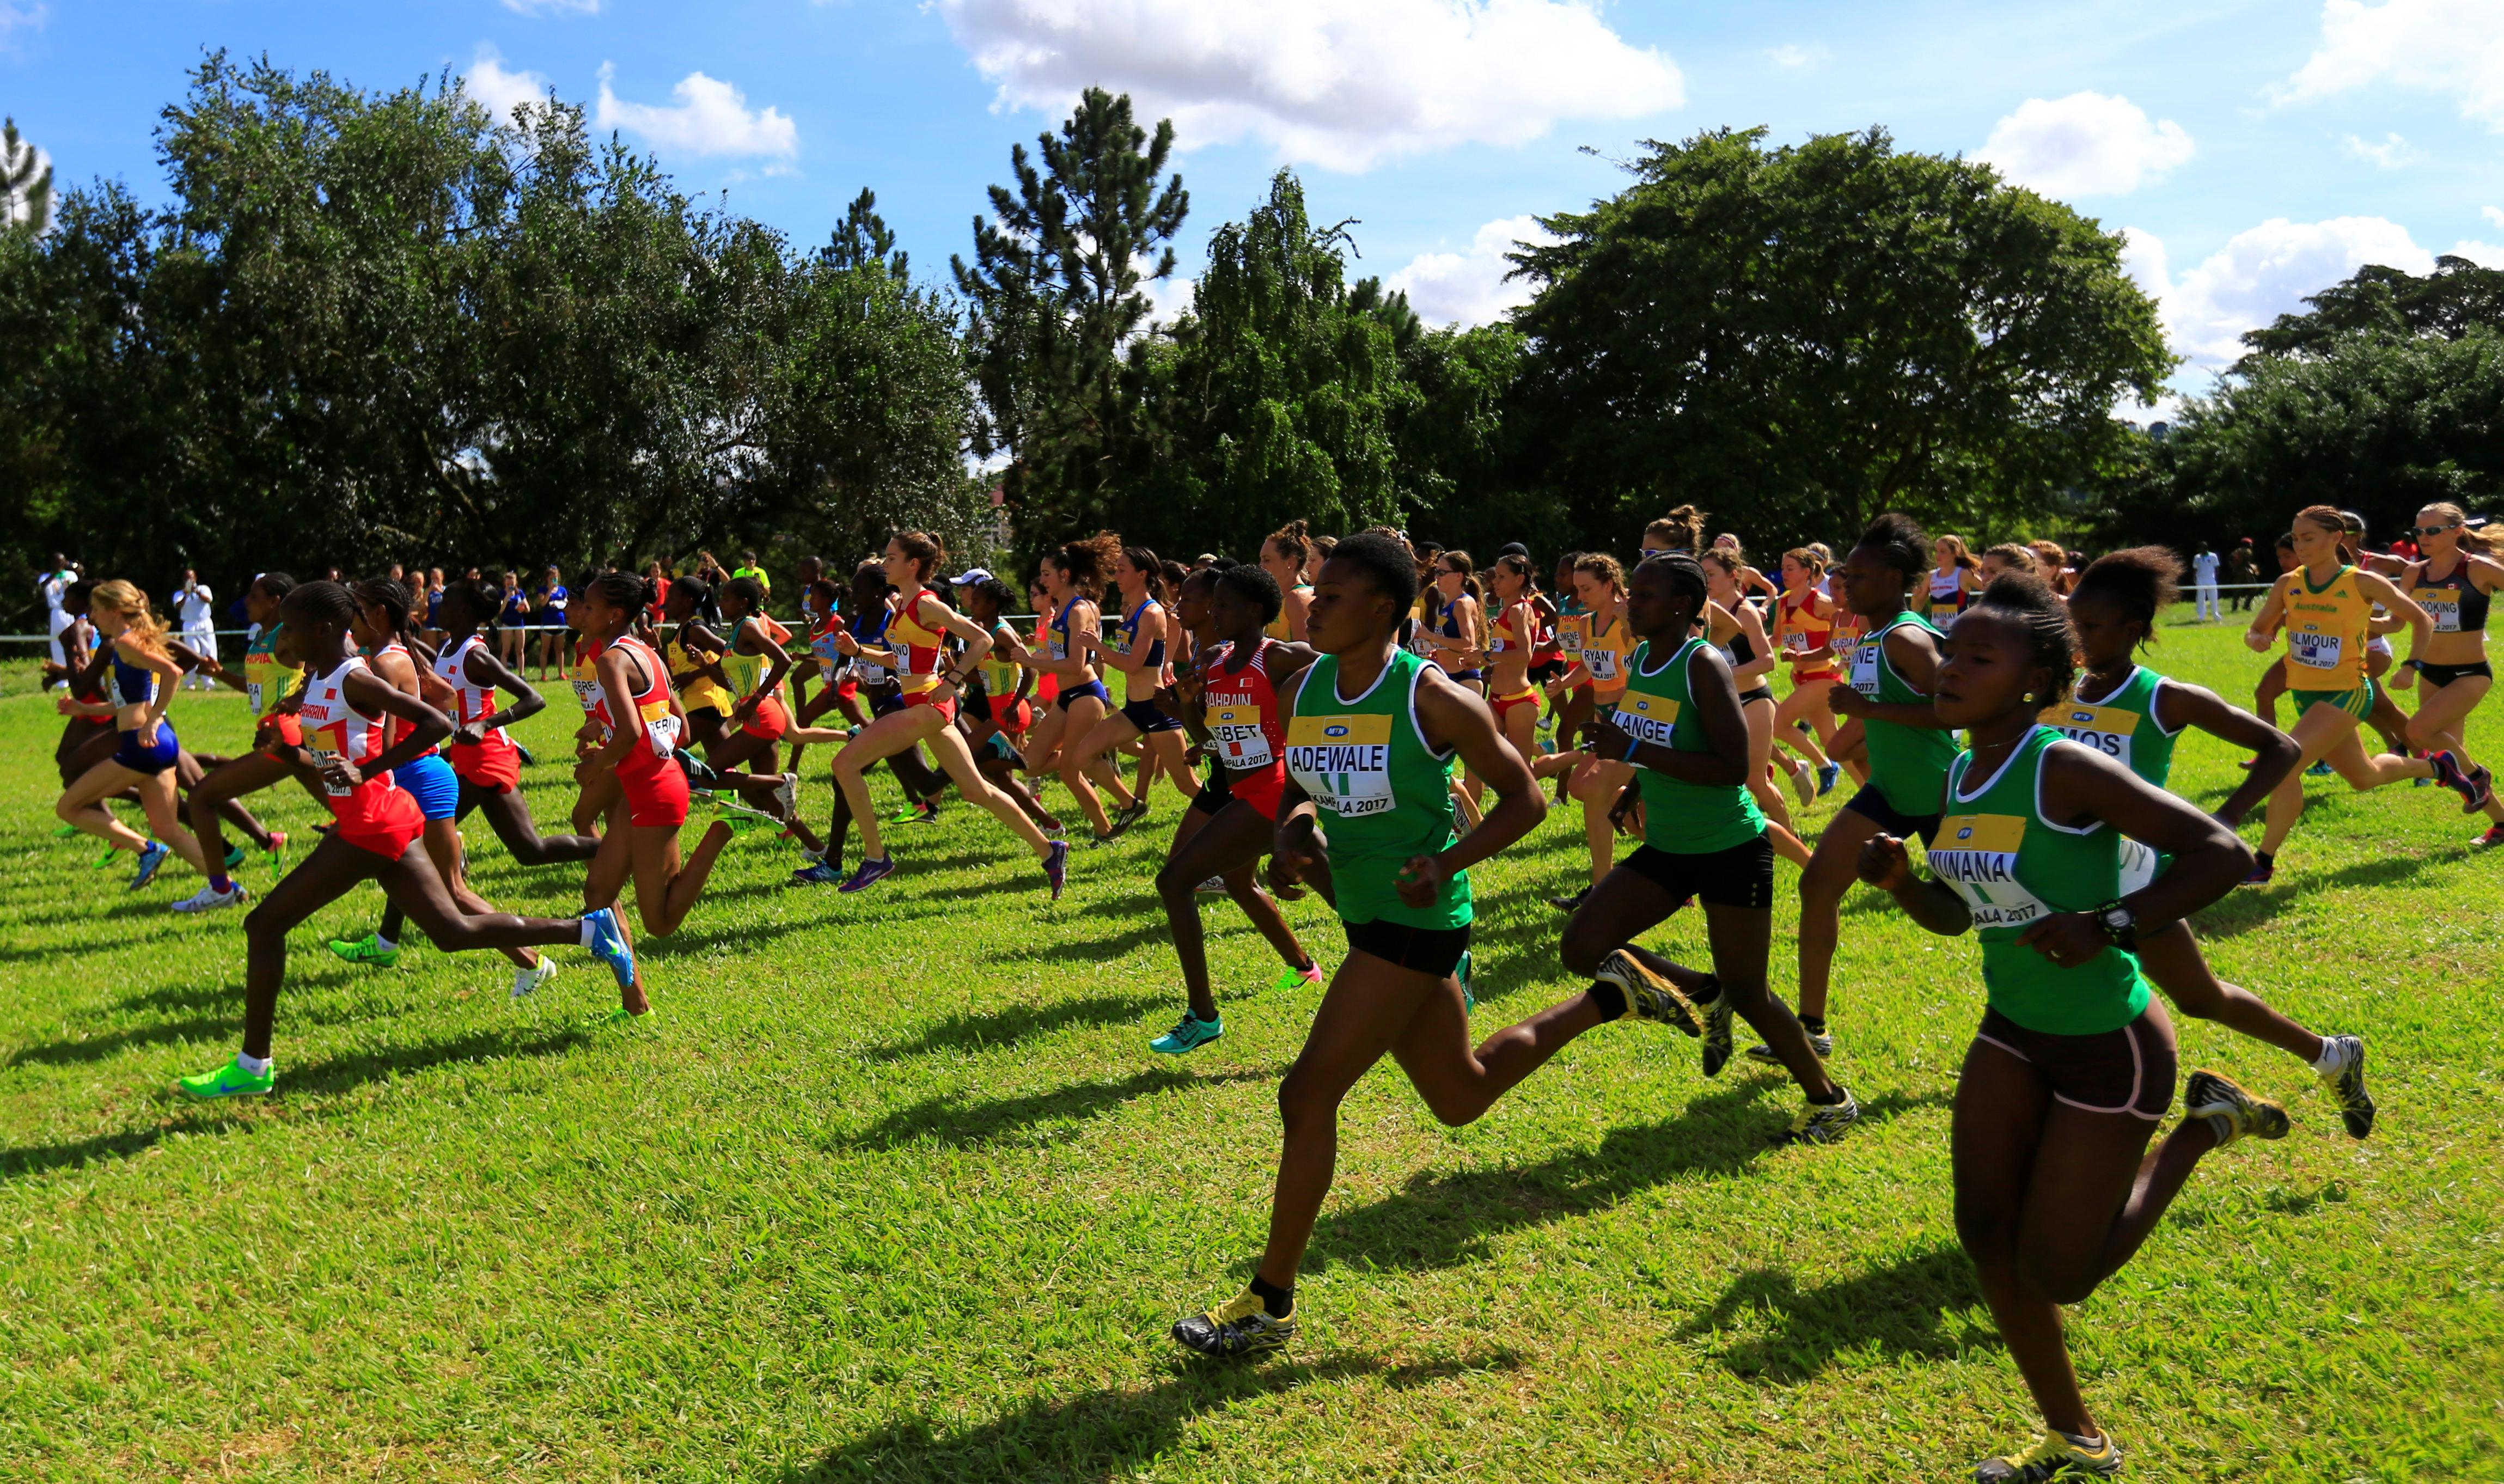 Athletics - IAAF World Cross Country Championships - Senior Race Women - Kololo Independence Grounds, Kampala, Uganda - 26/03/17 - Athletes run in the race. REUTERS/James Akena/File Photo